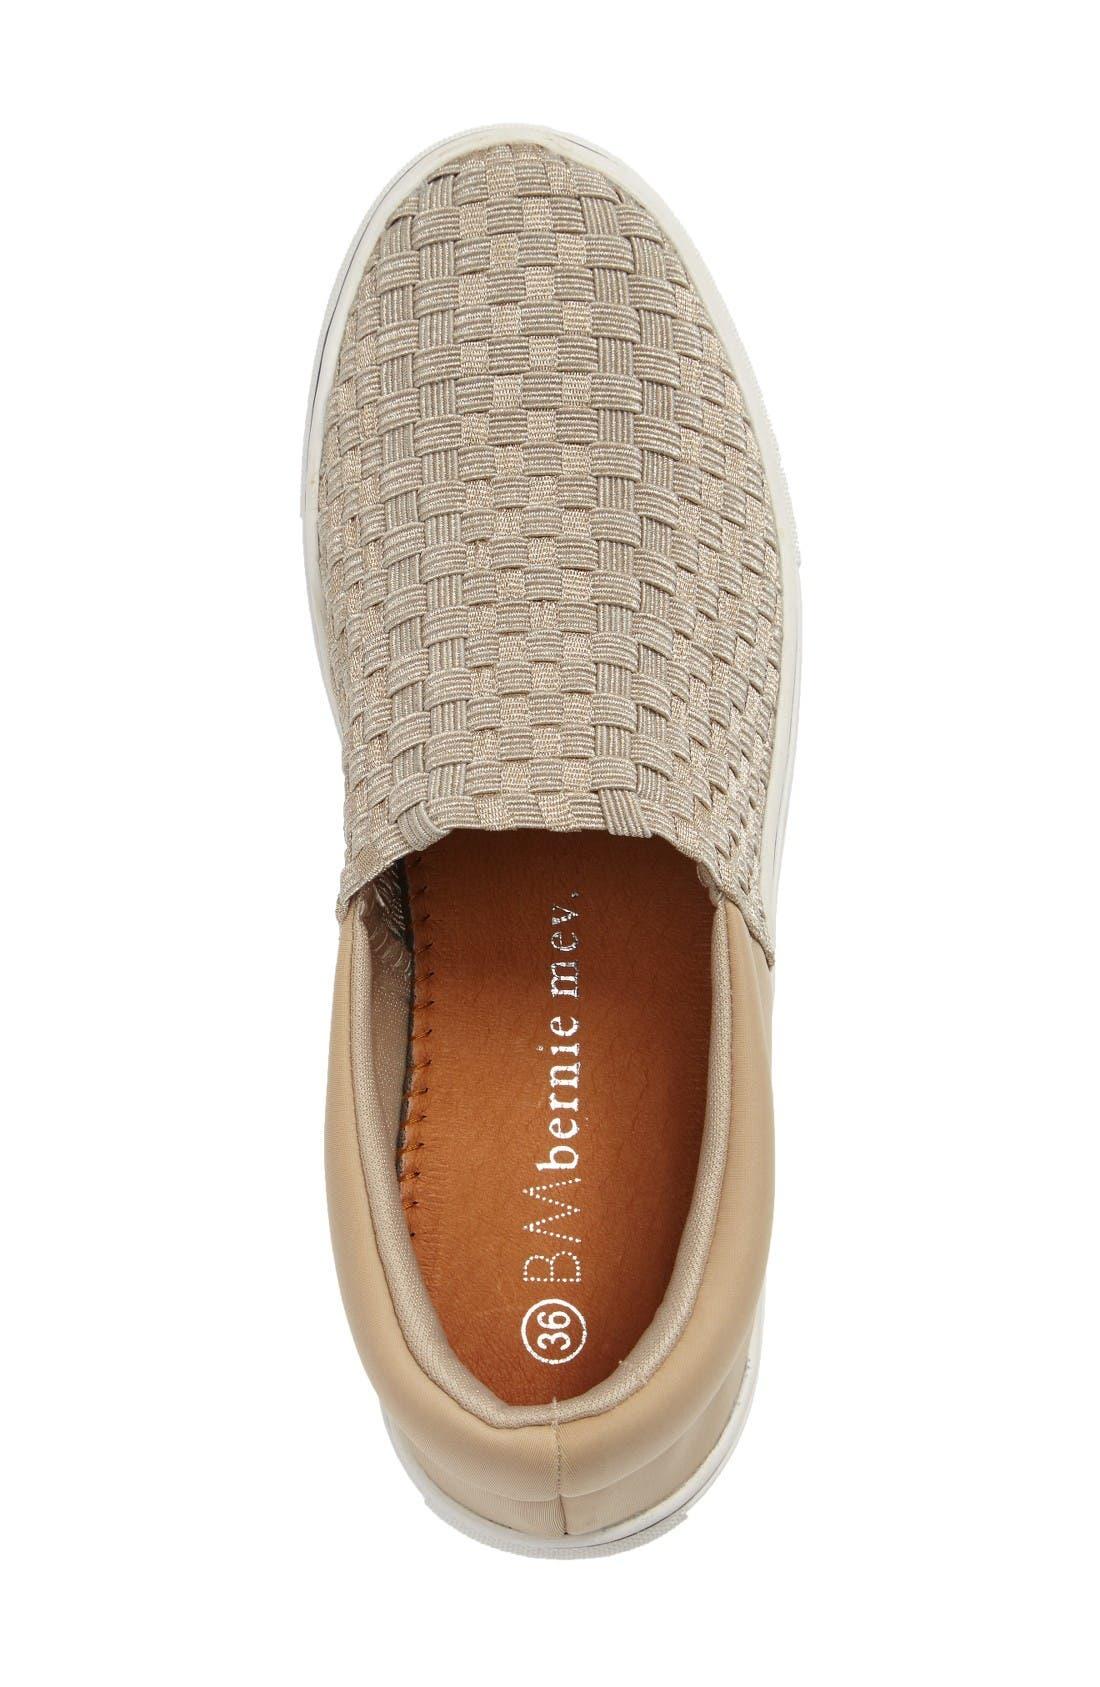 Ofelia Woven Elastic Sneaker,                             Alternate thumbnail 3, color,                             Light Gold Fabric